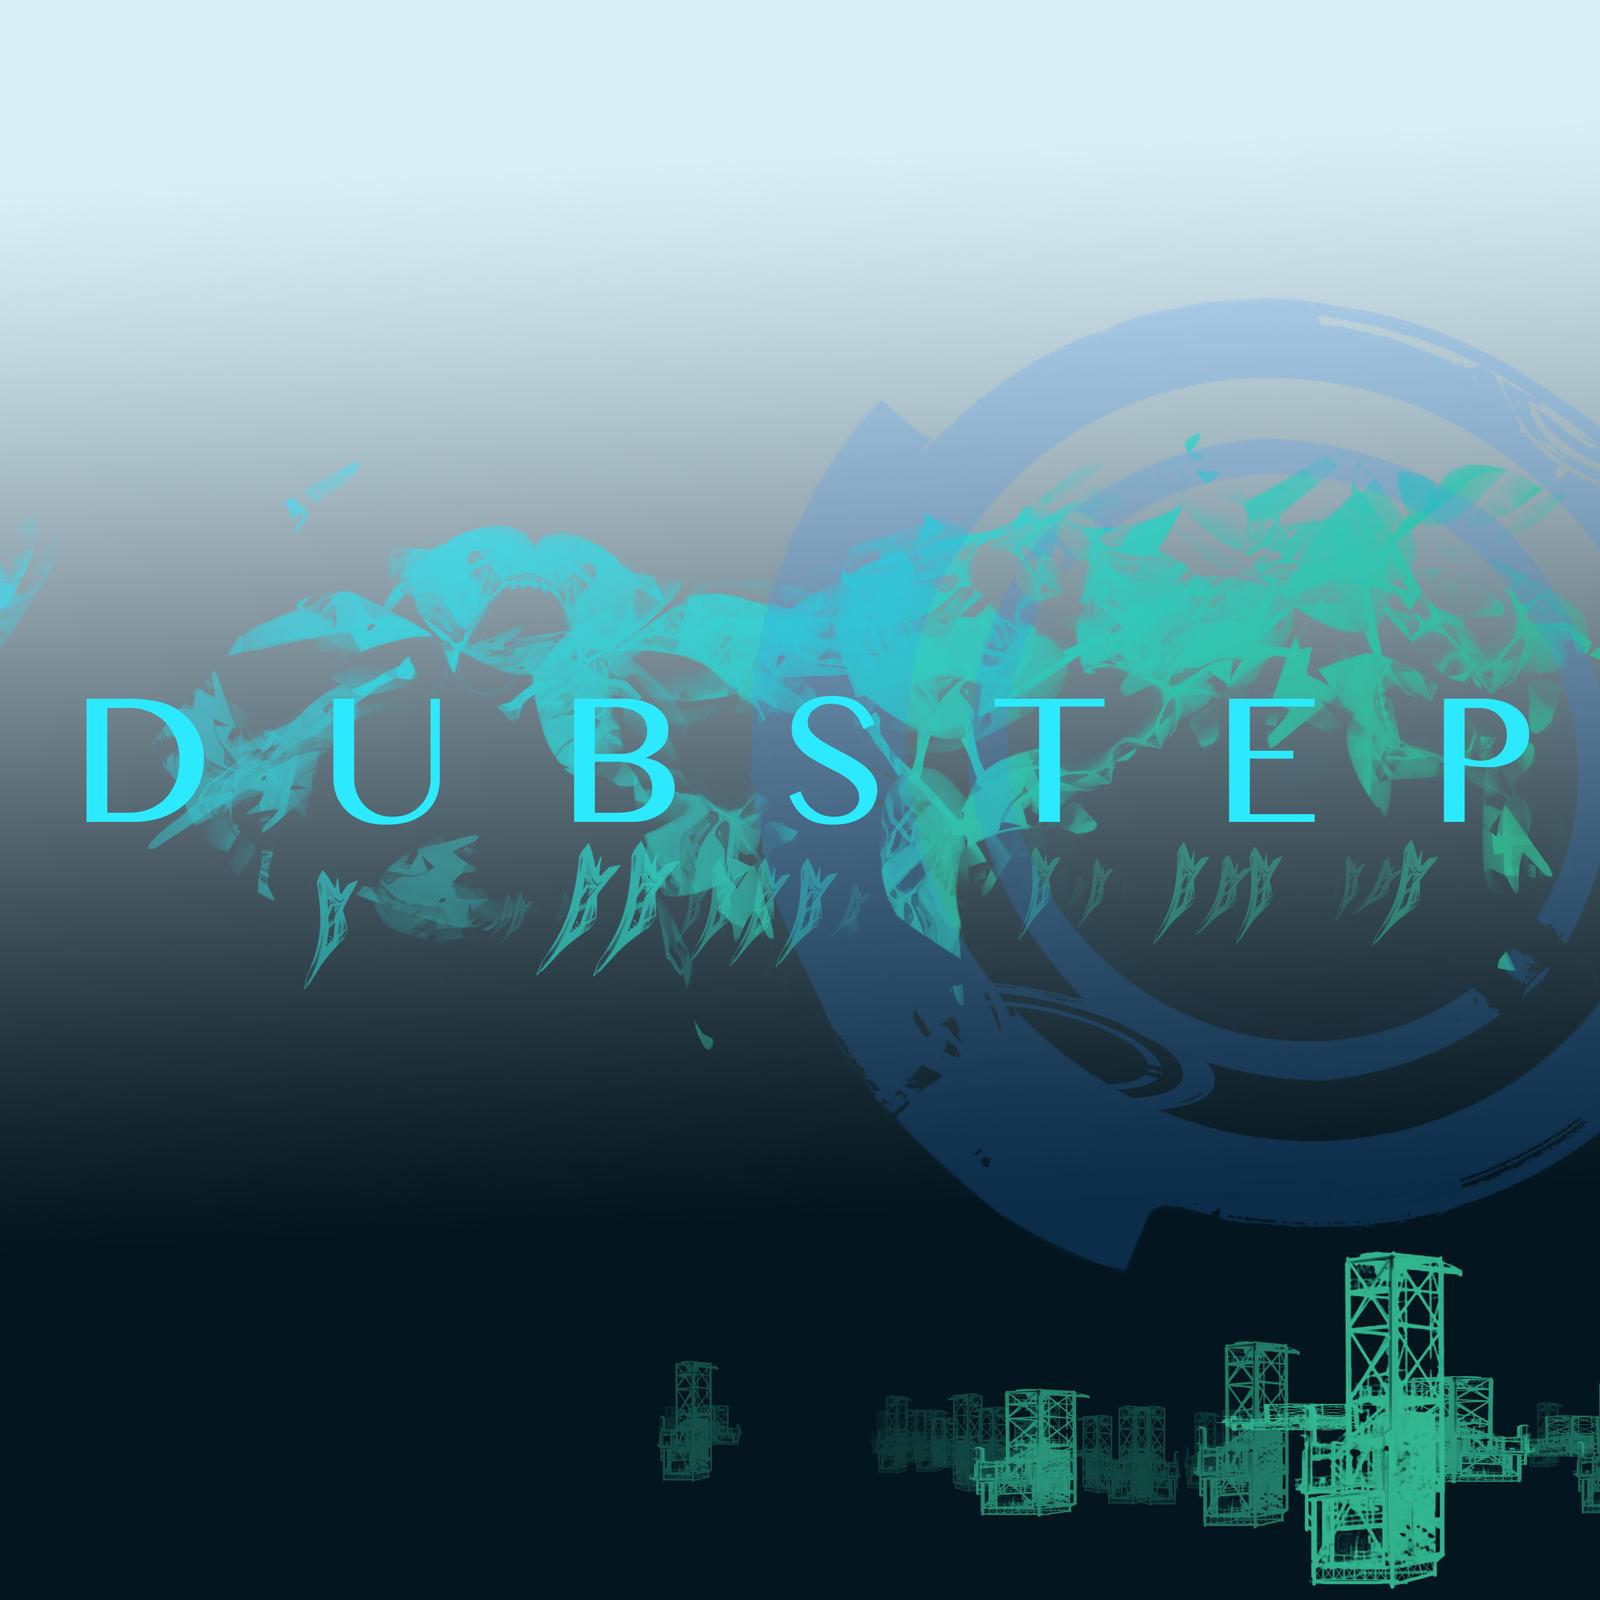 Dubstep cd covers 2 by JoshuaDunlop on DeviantArt